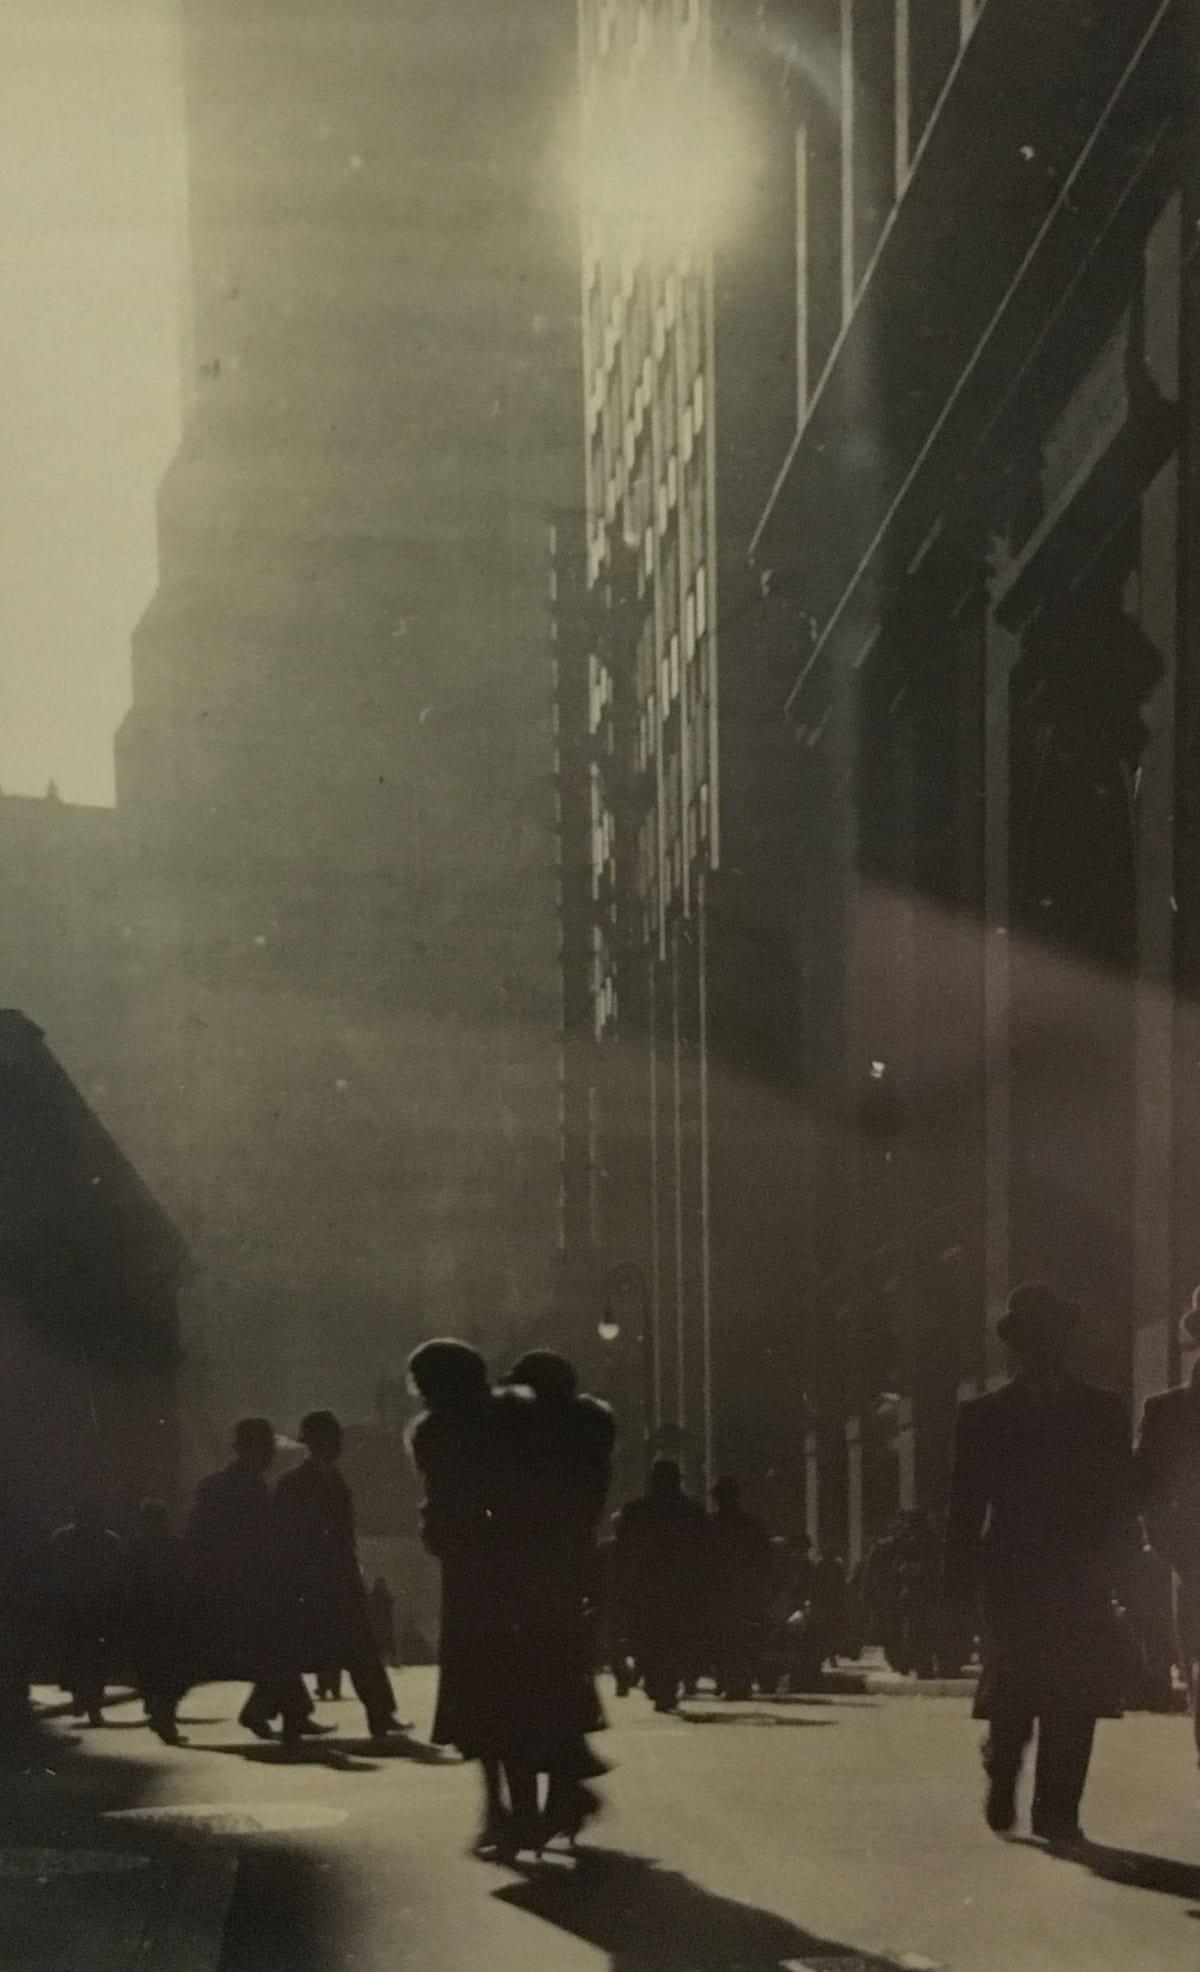 Fred Zinnemann Untitled [city view], 1932 Vintage gelatin silver print 3 1/8 x 2 inches